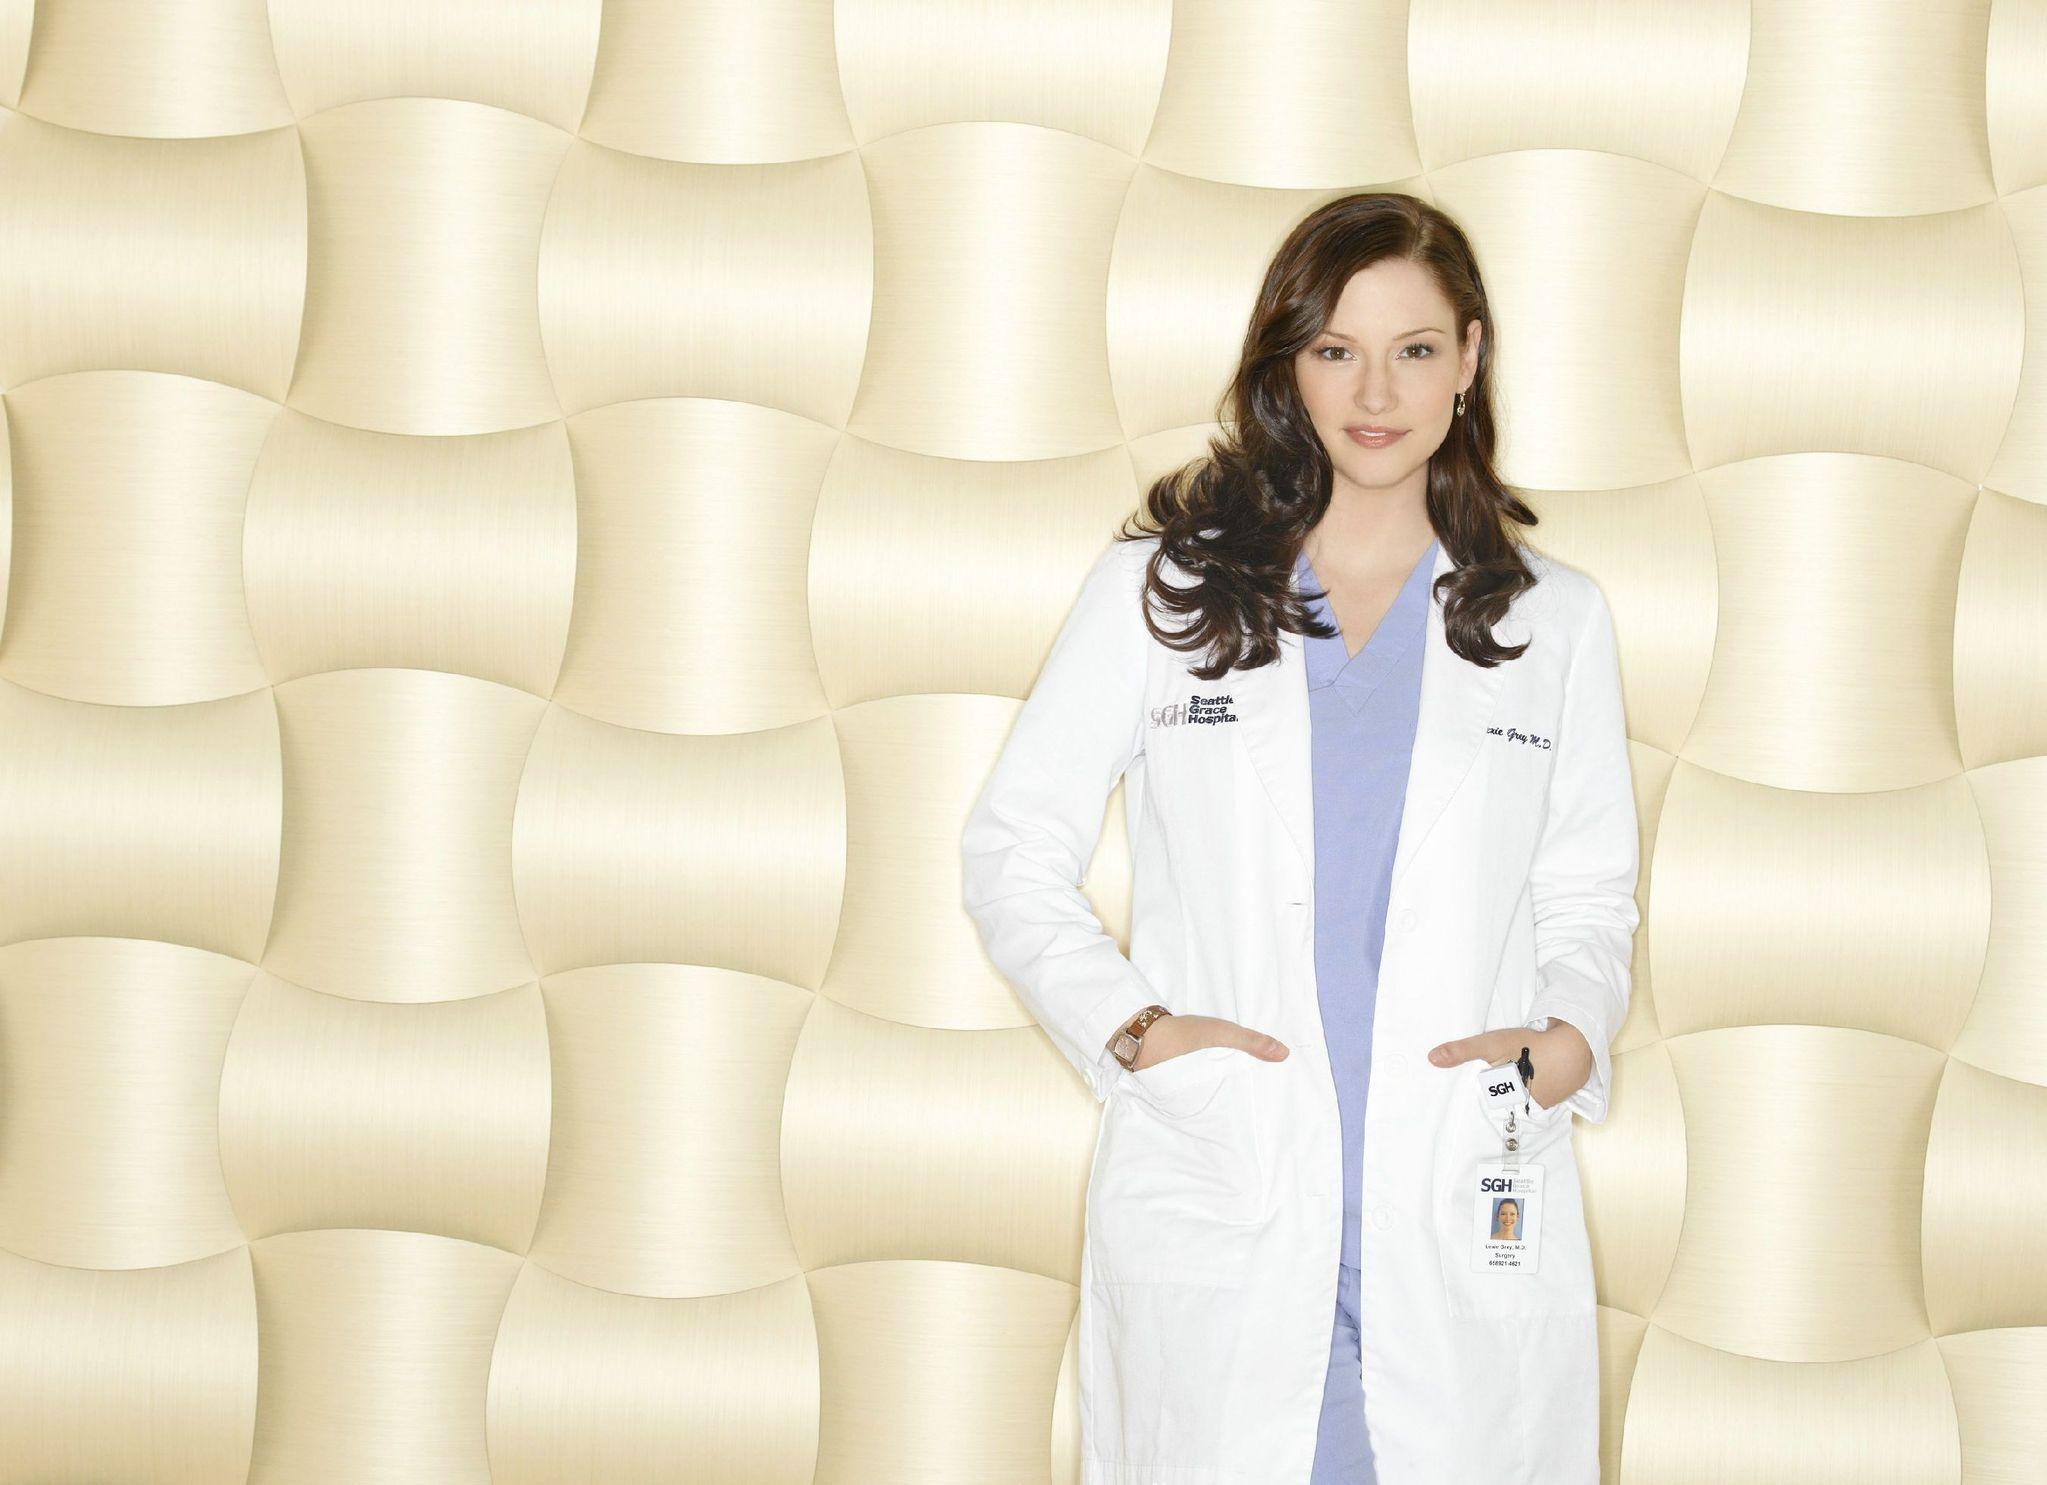 Grey\'s Anatomy - Season 6 Promo   Grey\'s Anatomy   Pinterest ...